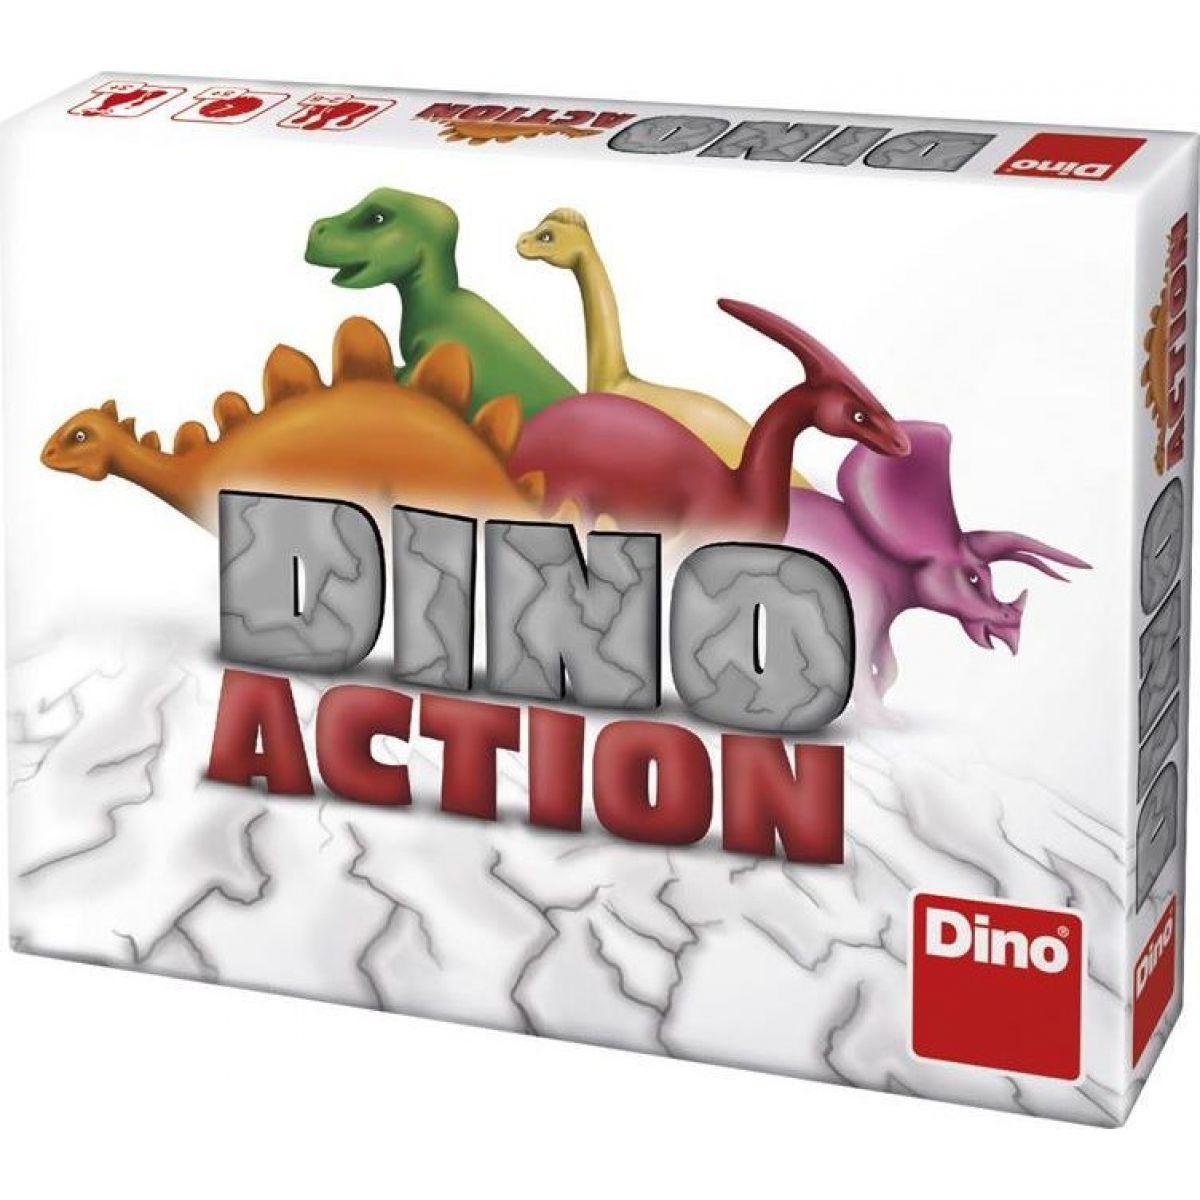 Dino Dinoaction cestovná hra